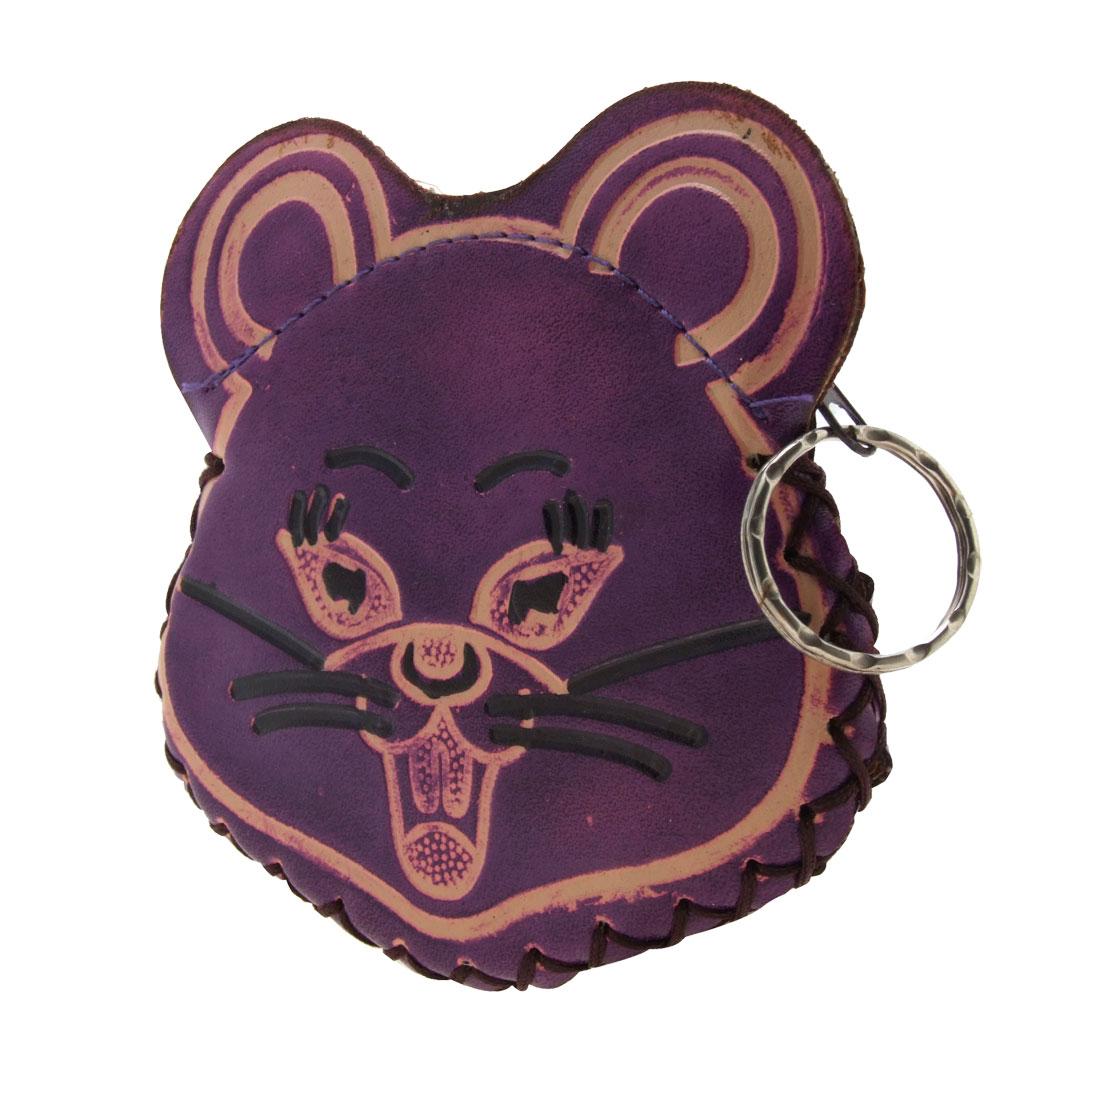 Fashion Mouse Head Lady Purse Pocket Money Wallet Zipper Bag w. Key Ring